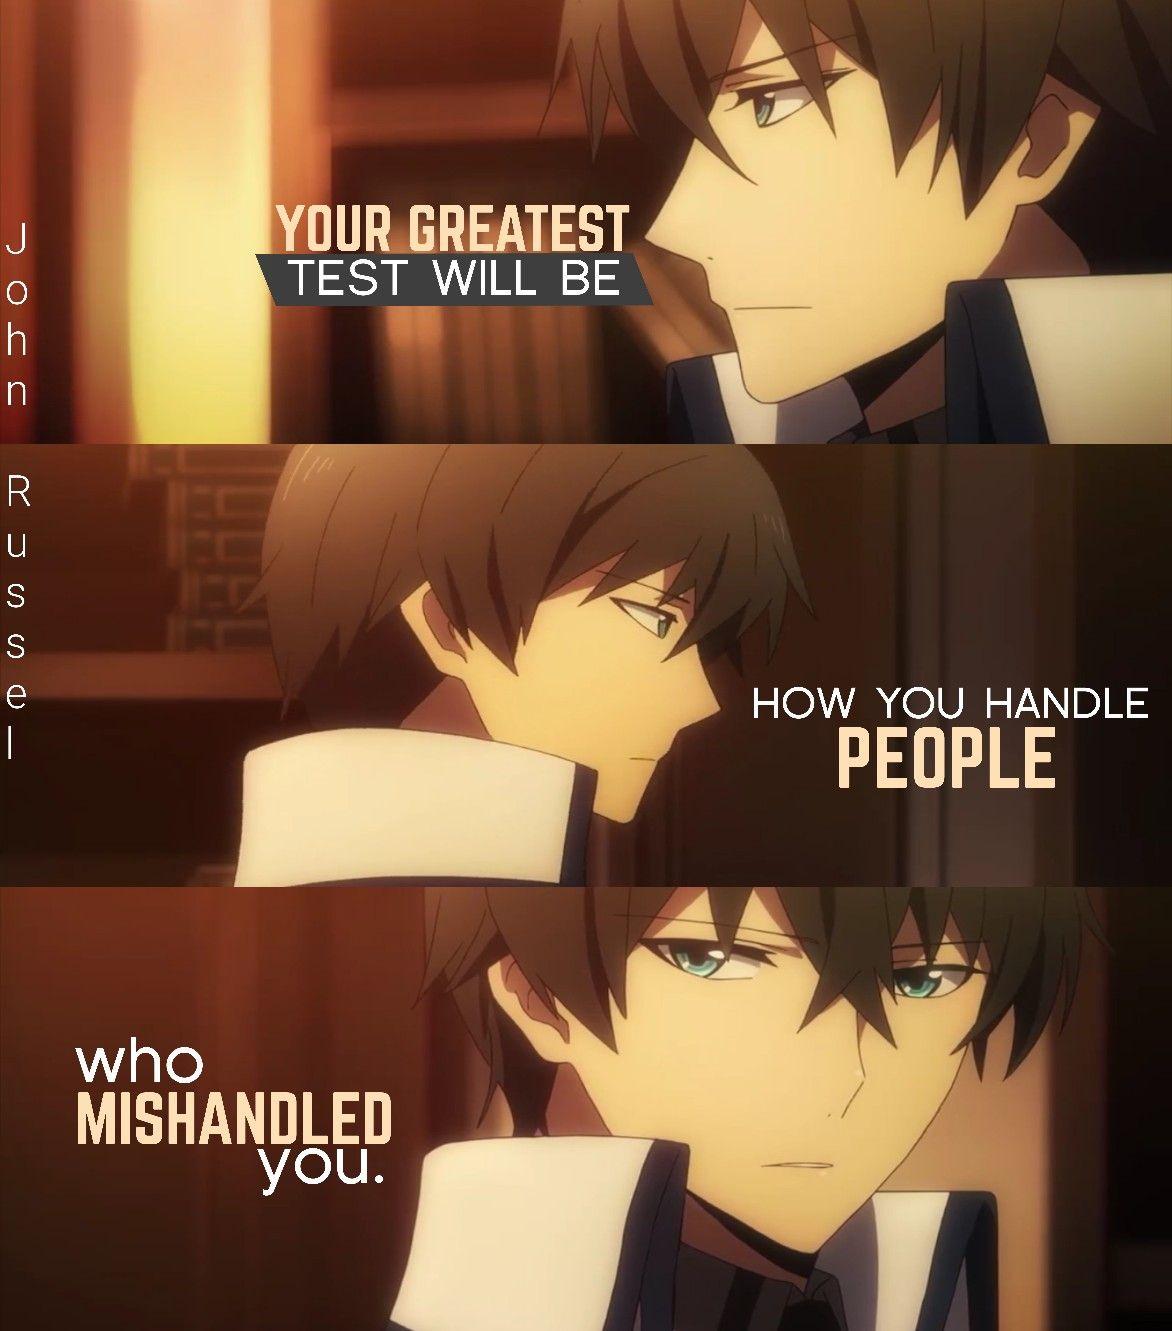 Mahouka Koukou No Rettosei Anime Quotes Inspirational Anime Love Quotes Animation Quotes